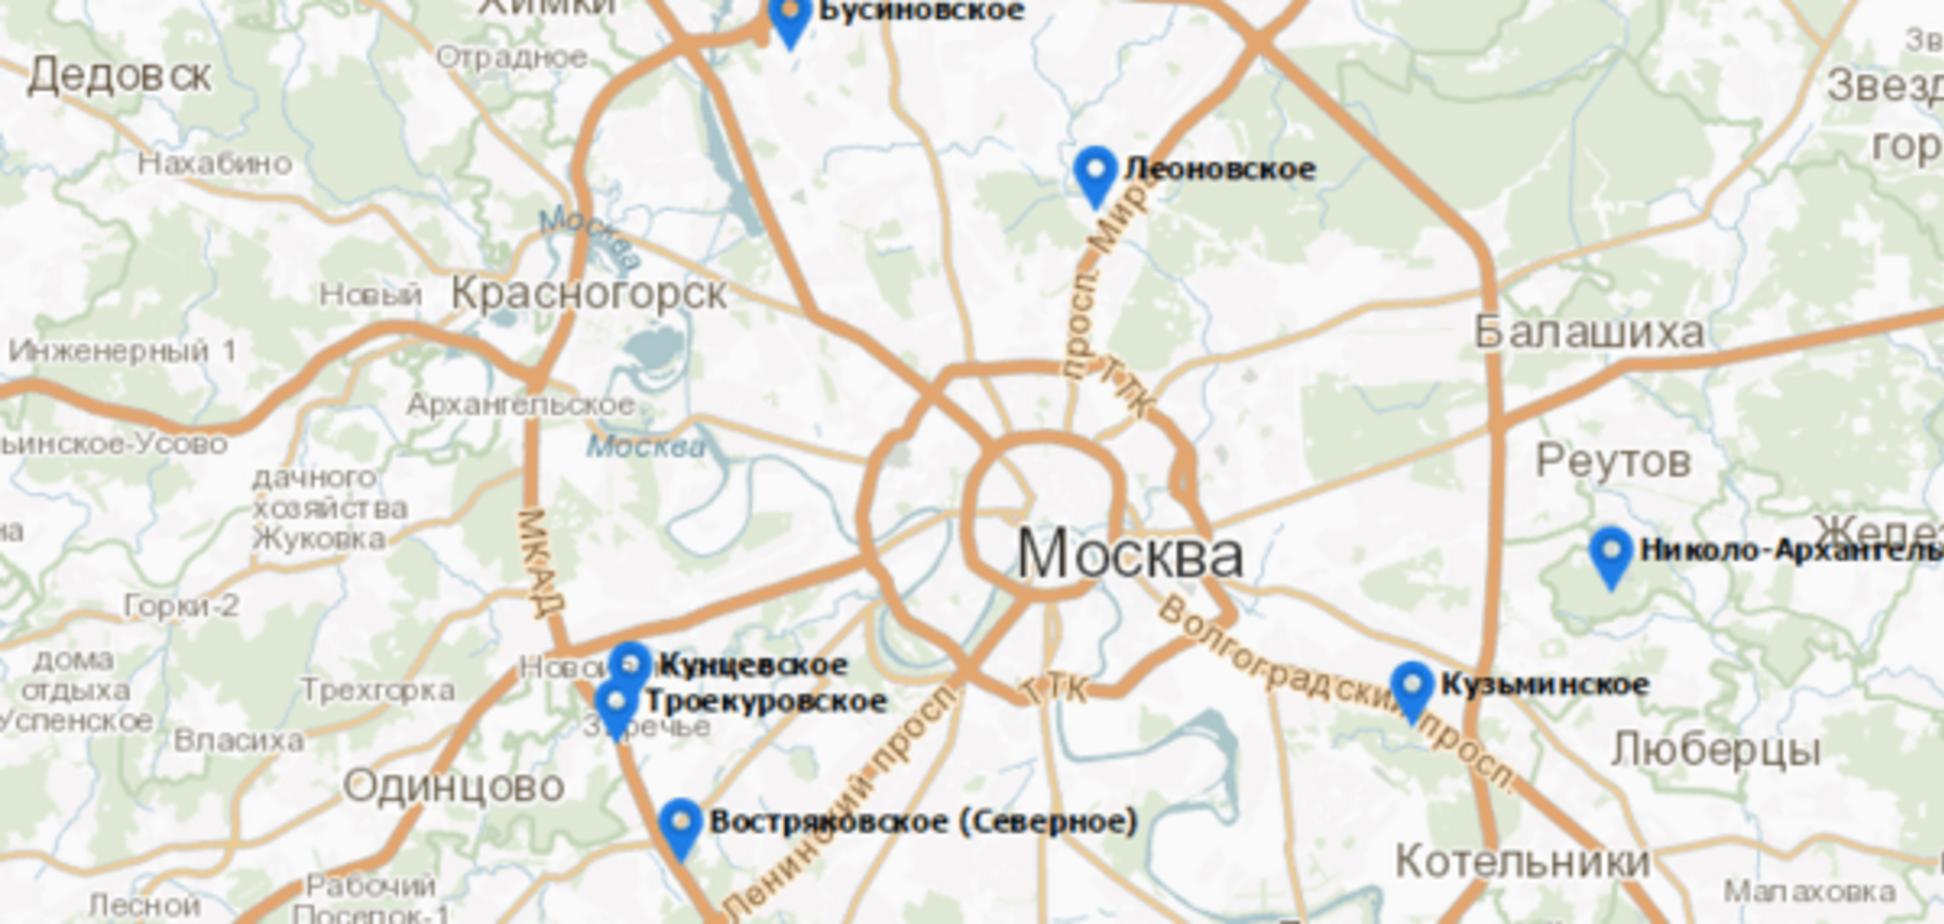 Чорний гумор: влада Москви запустили сайт з панорамами кладовищ